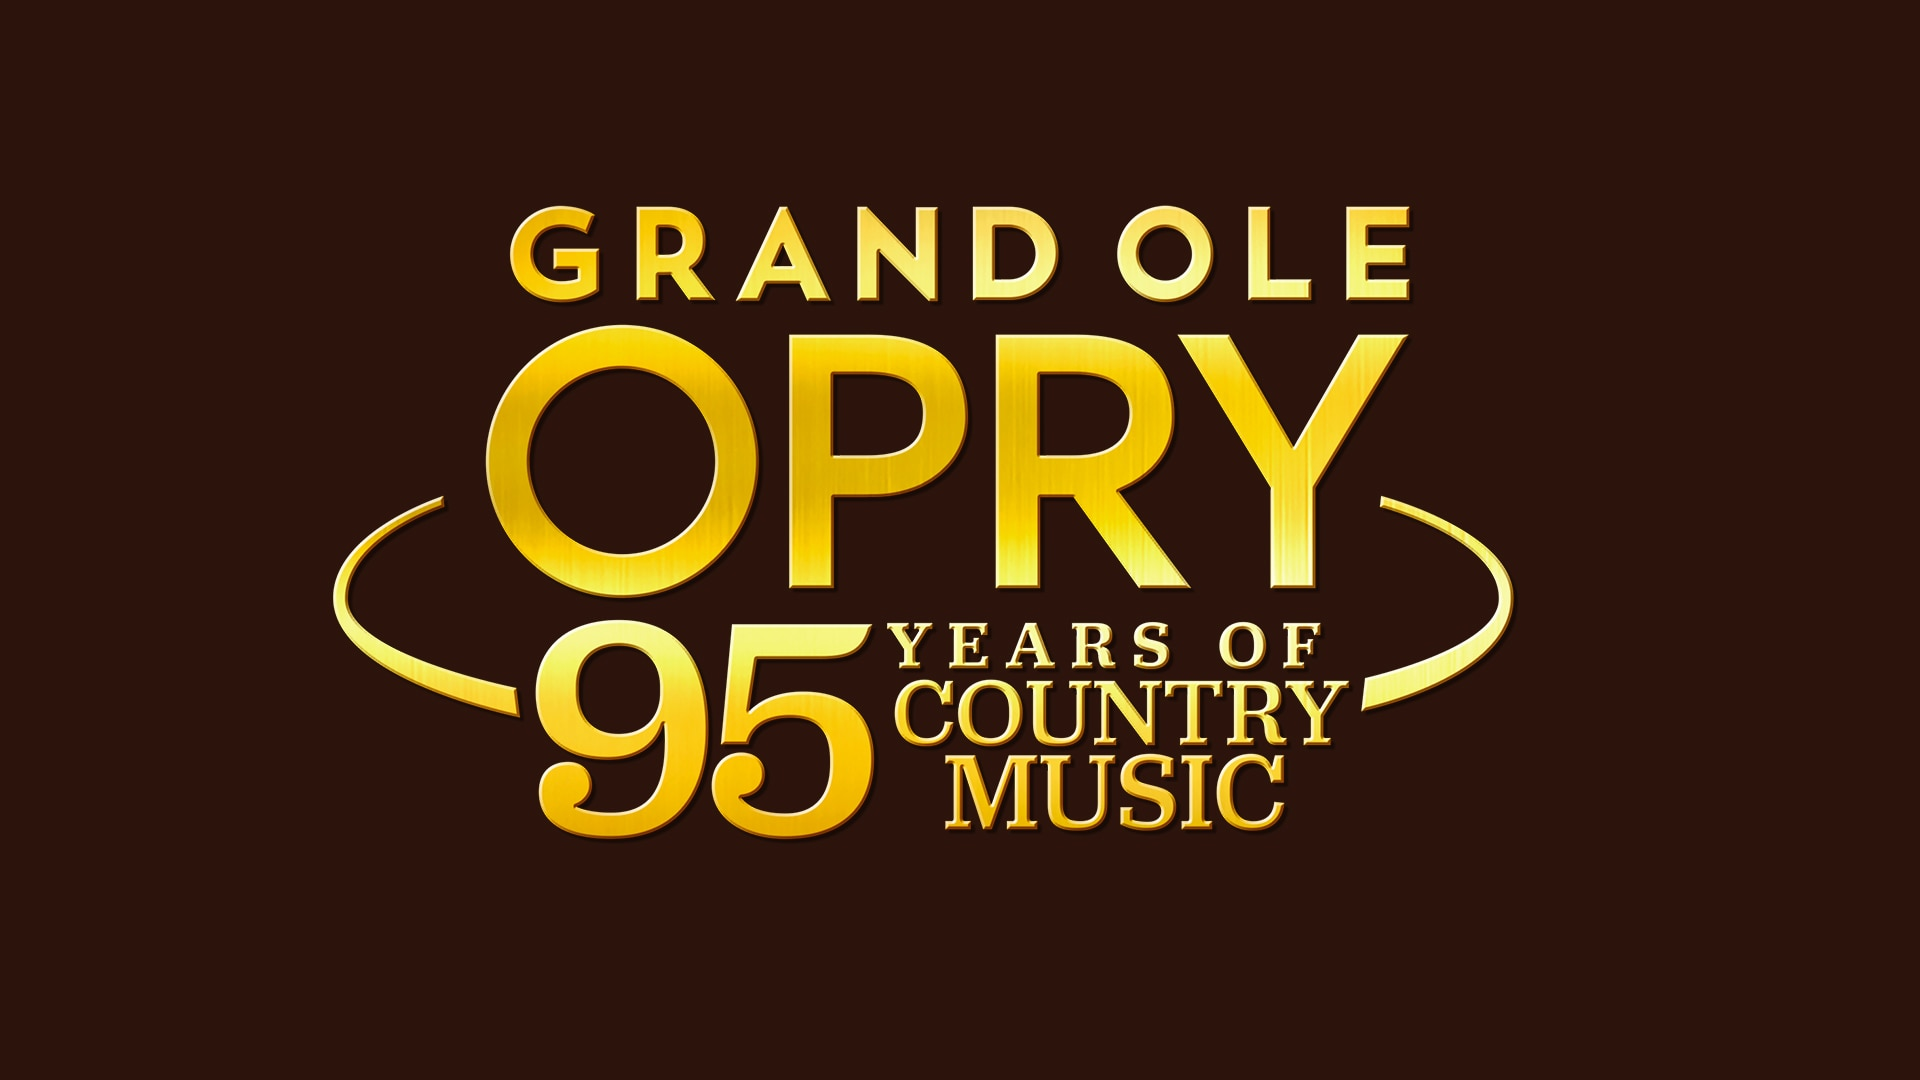 GrandOleOpry95-Logo-1920x1080.jpg